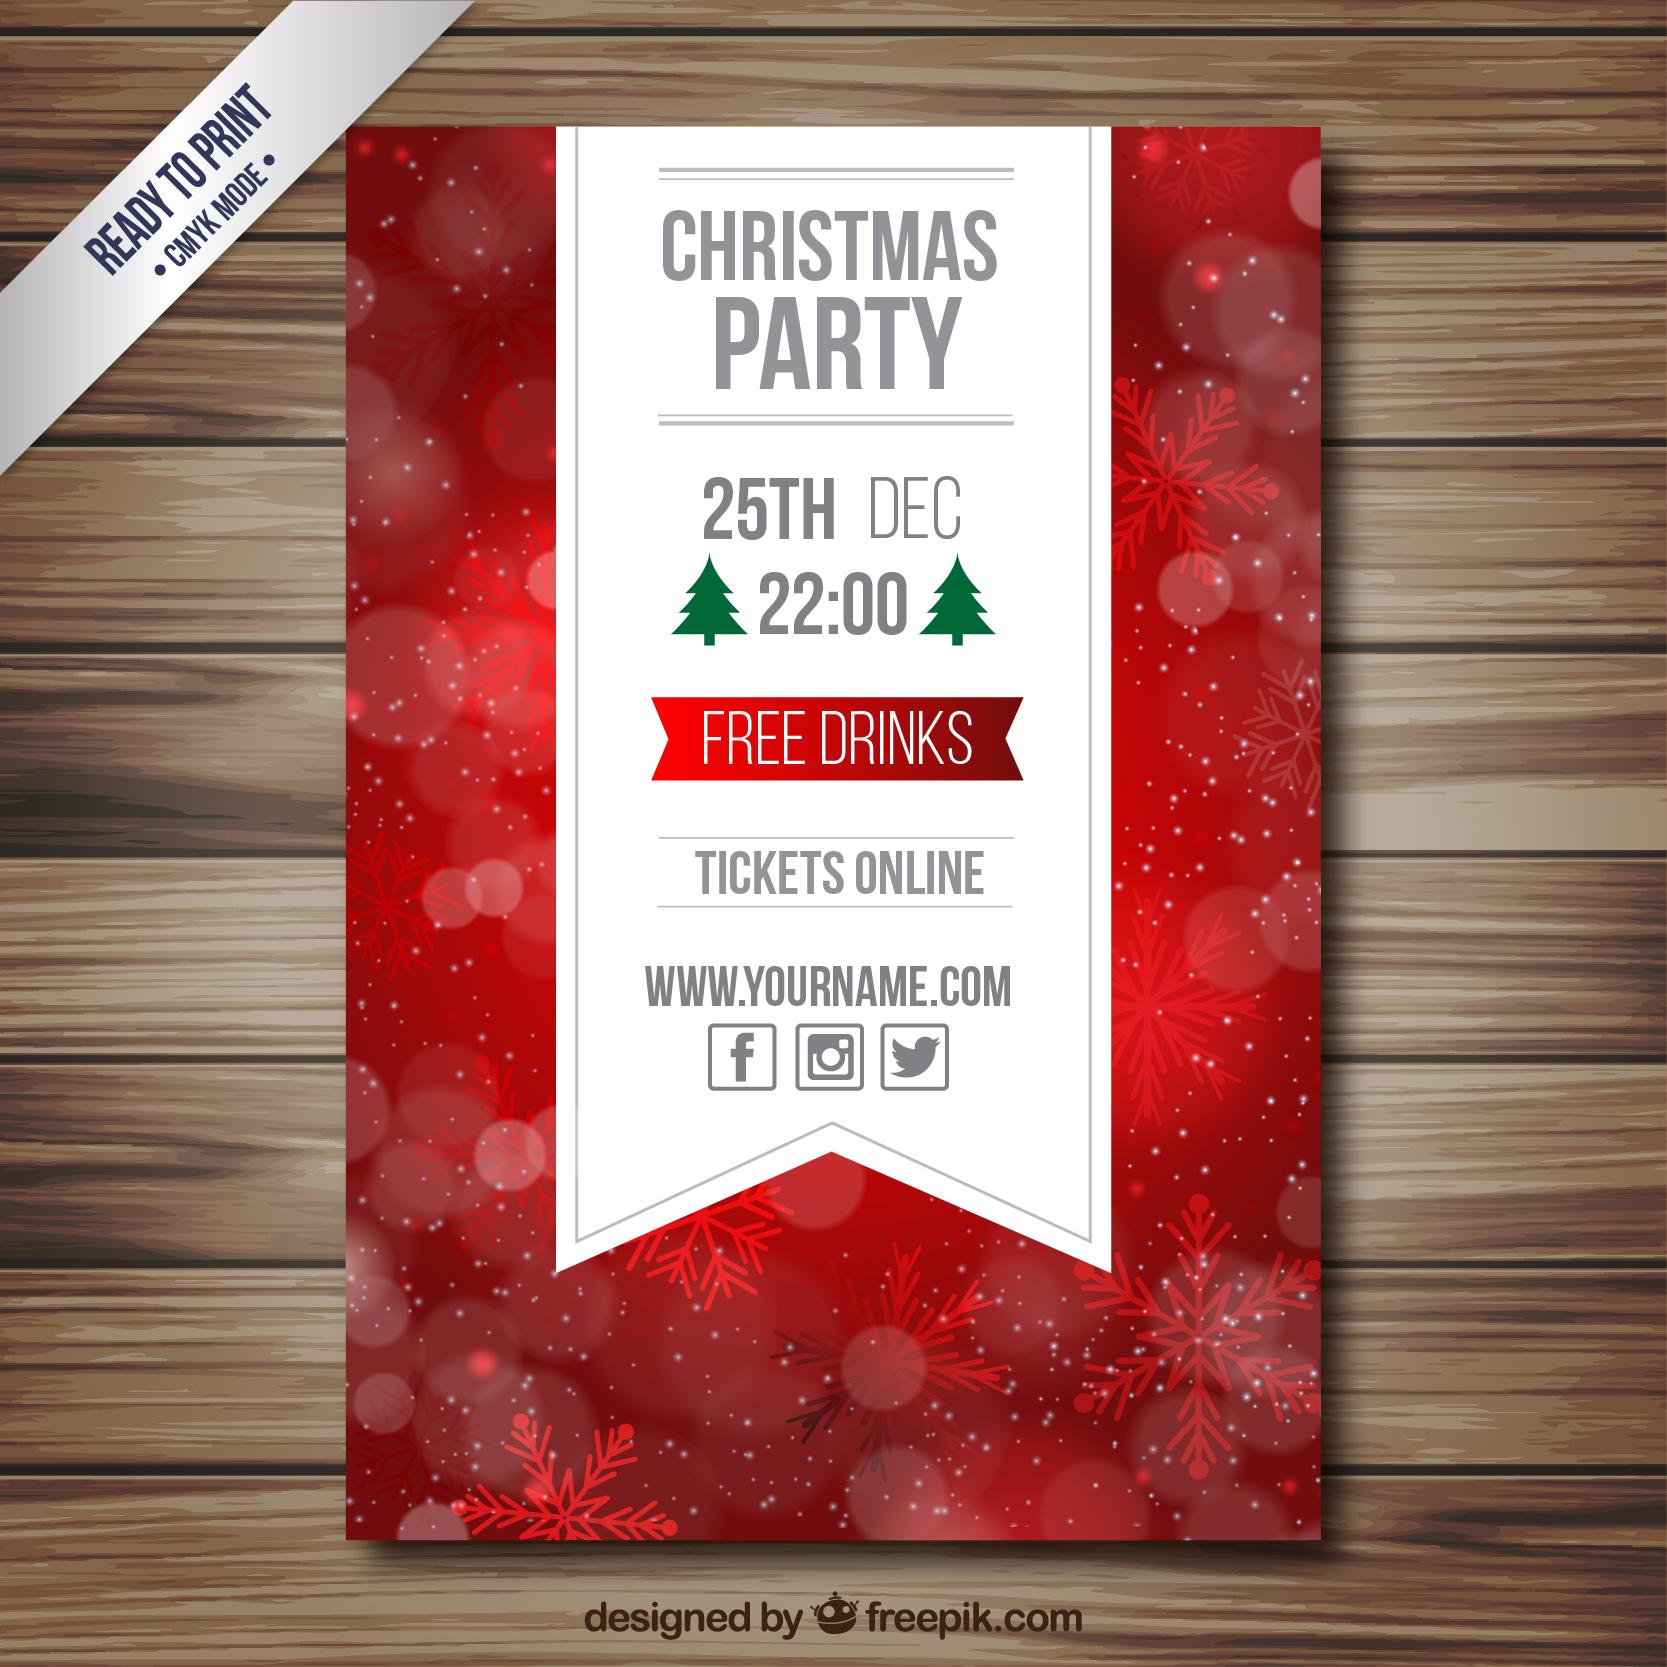 1667x1667 Xmas Freebies 25 Best Hi Quality Christmas Graphic Vectors 2015